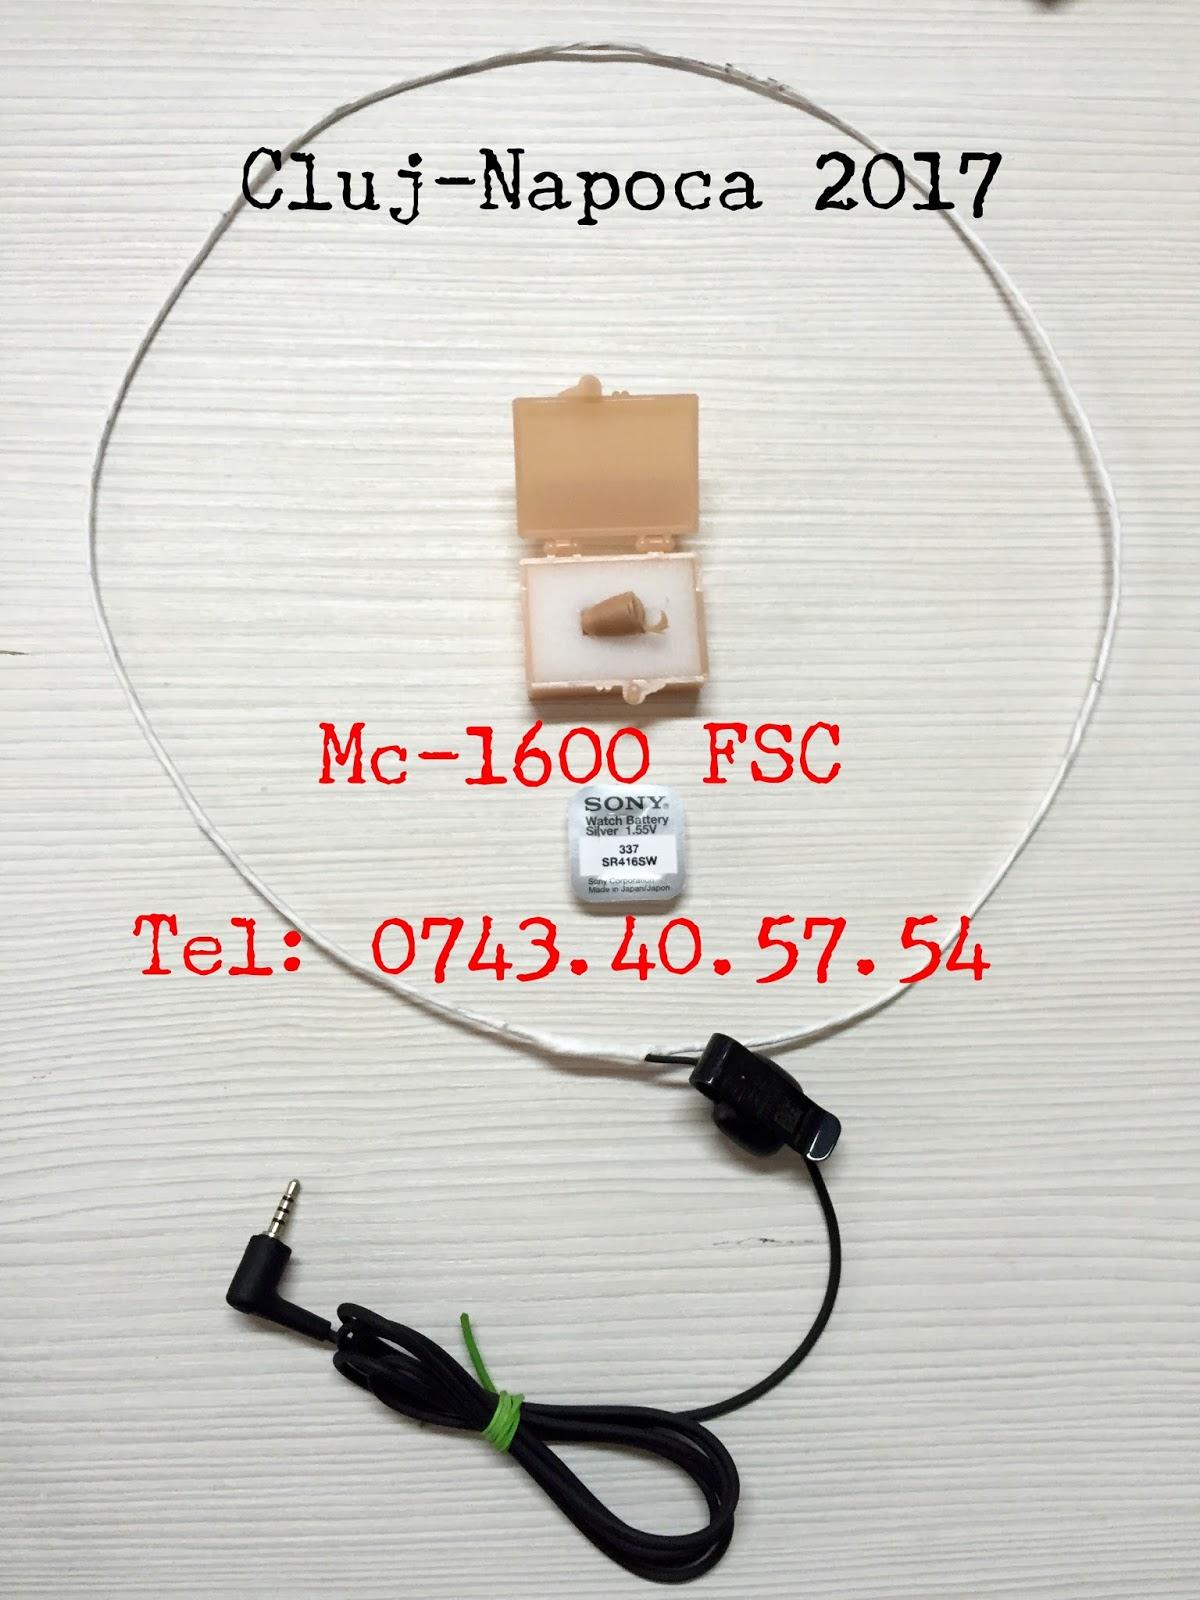 sistem colier casca japoneza motorola mc 1600 fsc mc 1700 fsc mc2000 actuala denumire nejustificata 1 baterie functioneaza la orice telefon sau  [ 1200 x 1600 Pixel ]